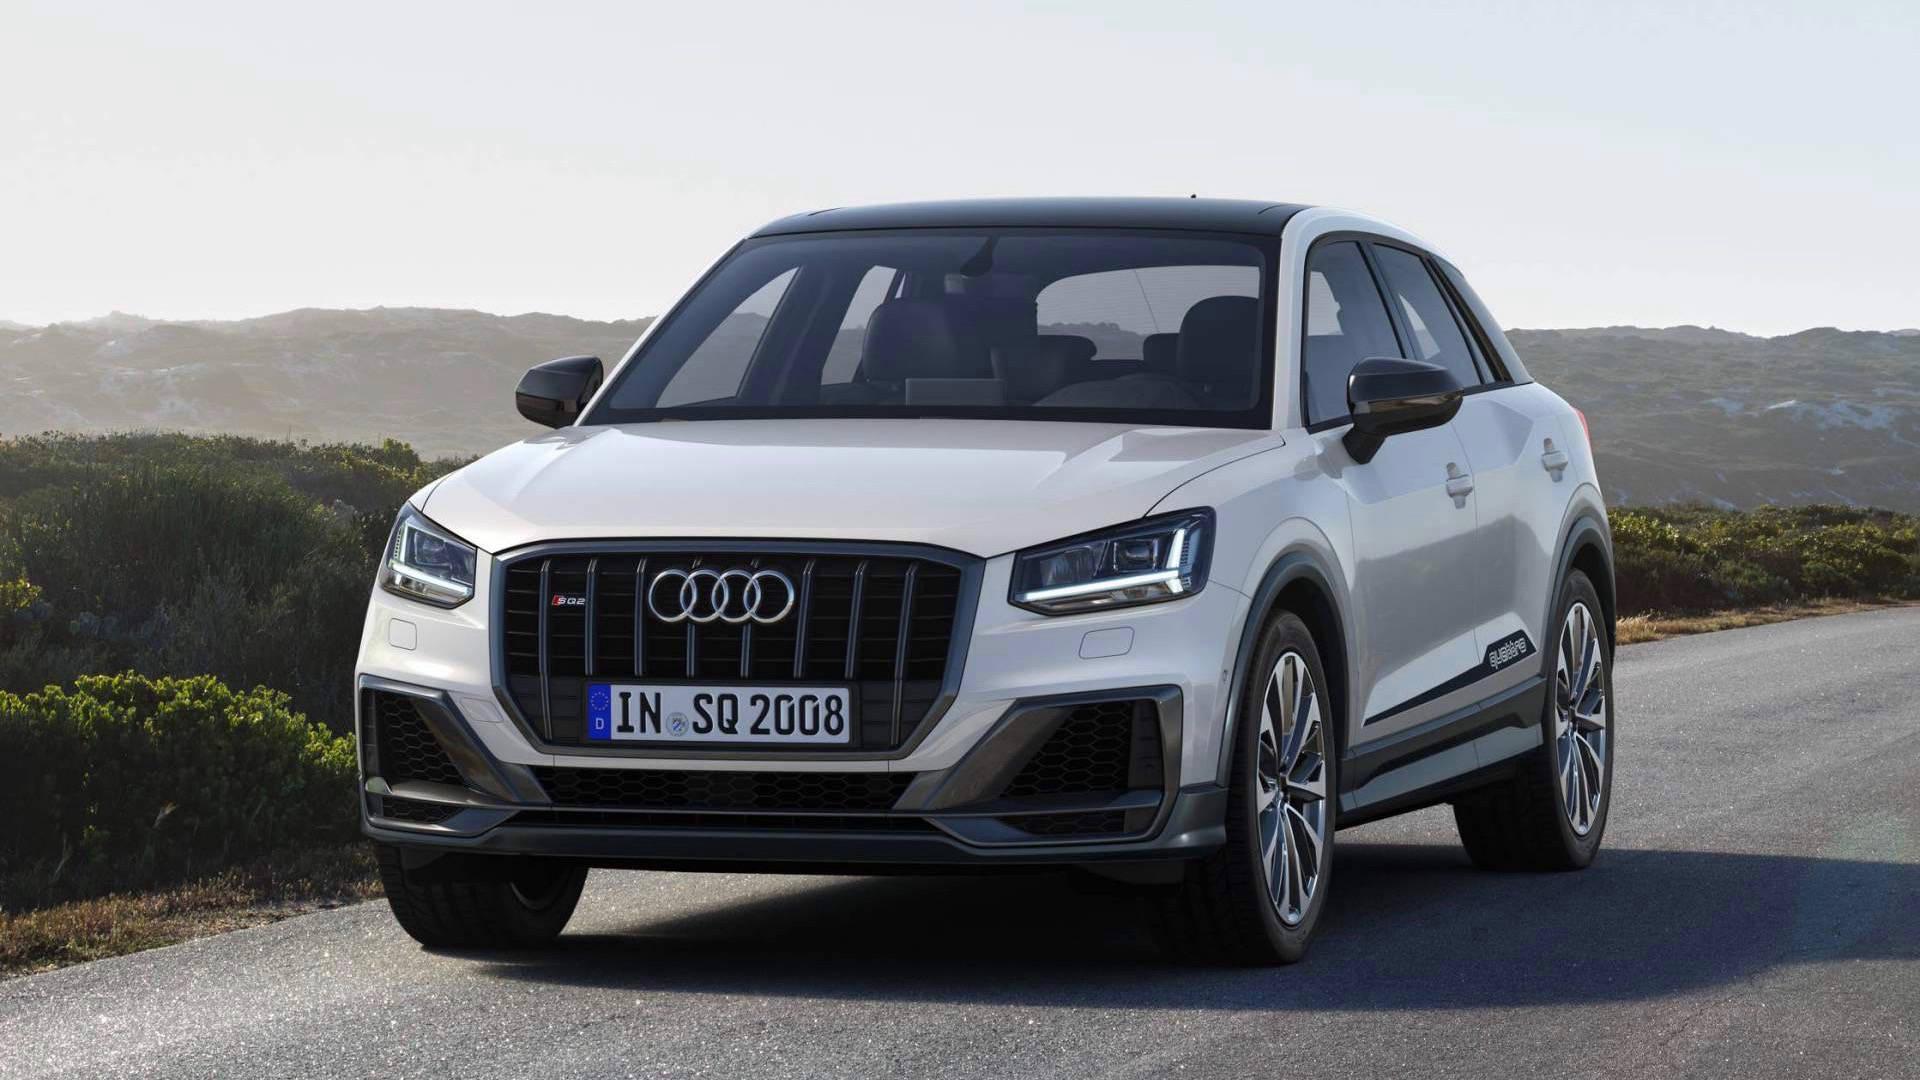 2019 Audi SQ2 front 3/4